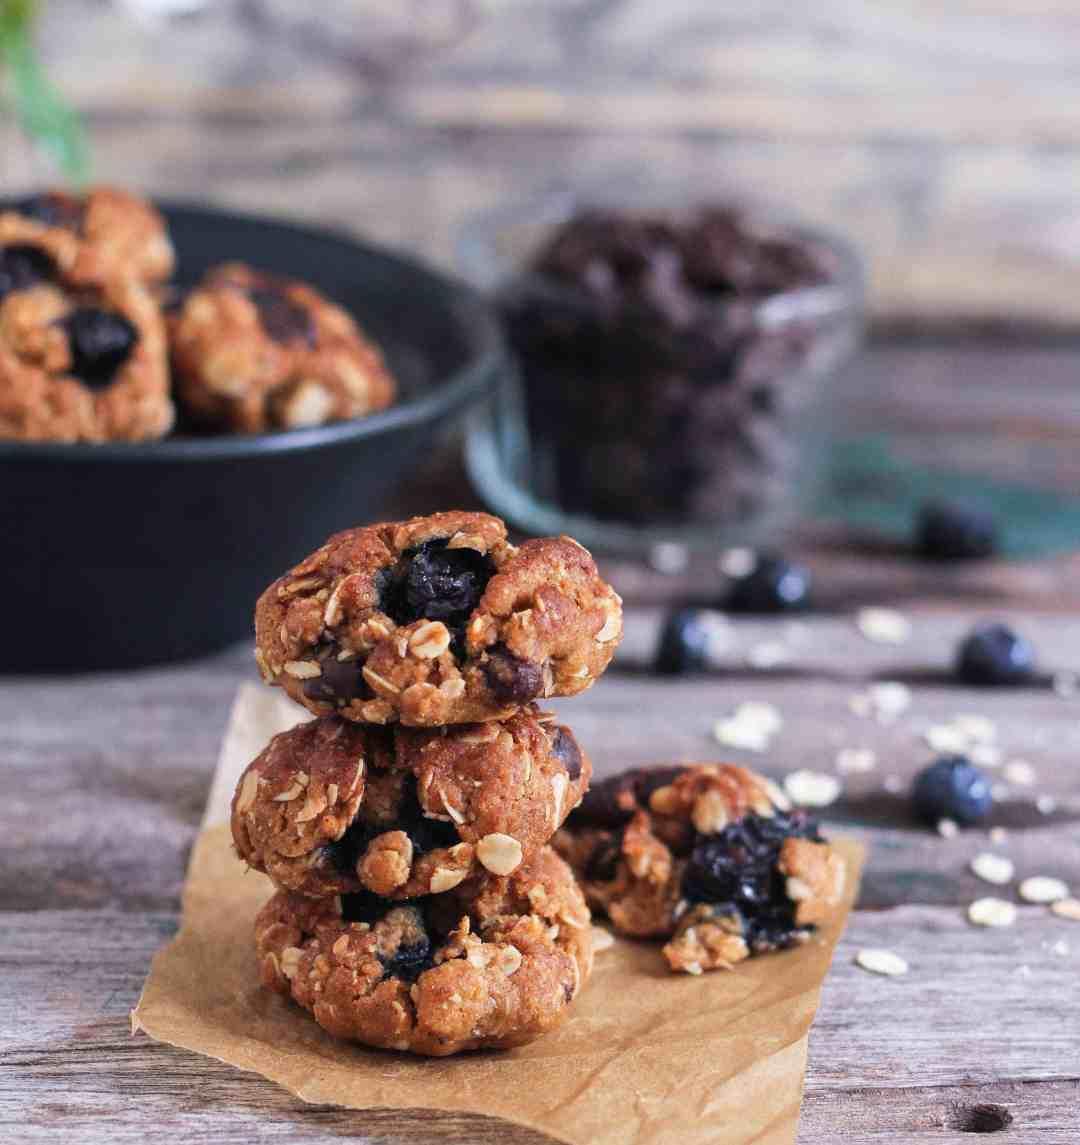 Blueberry Chocolate Chip Cookies wholegrain oatmeal vegan recipe